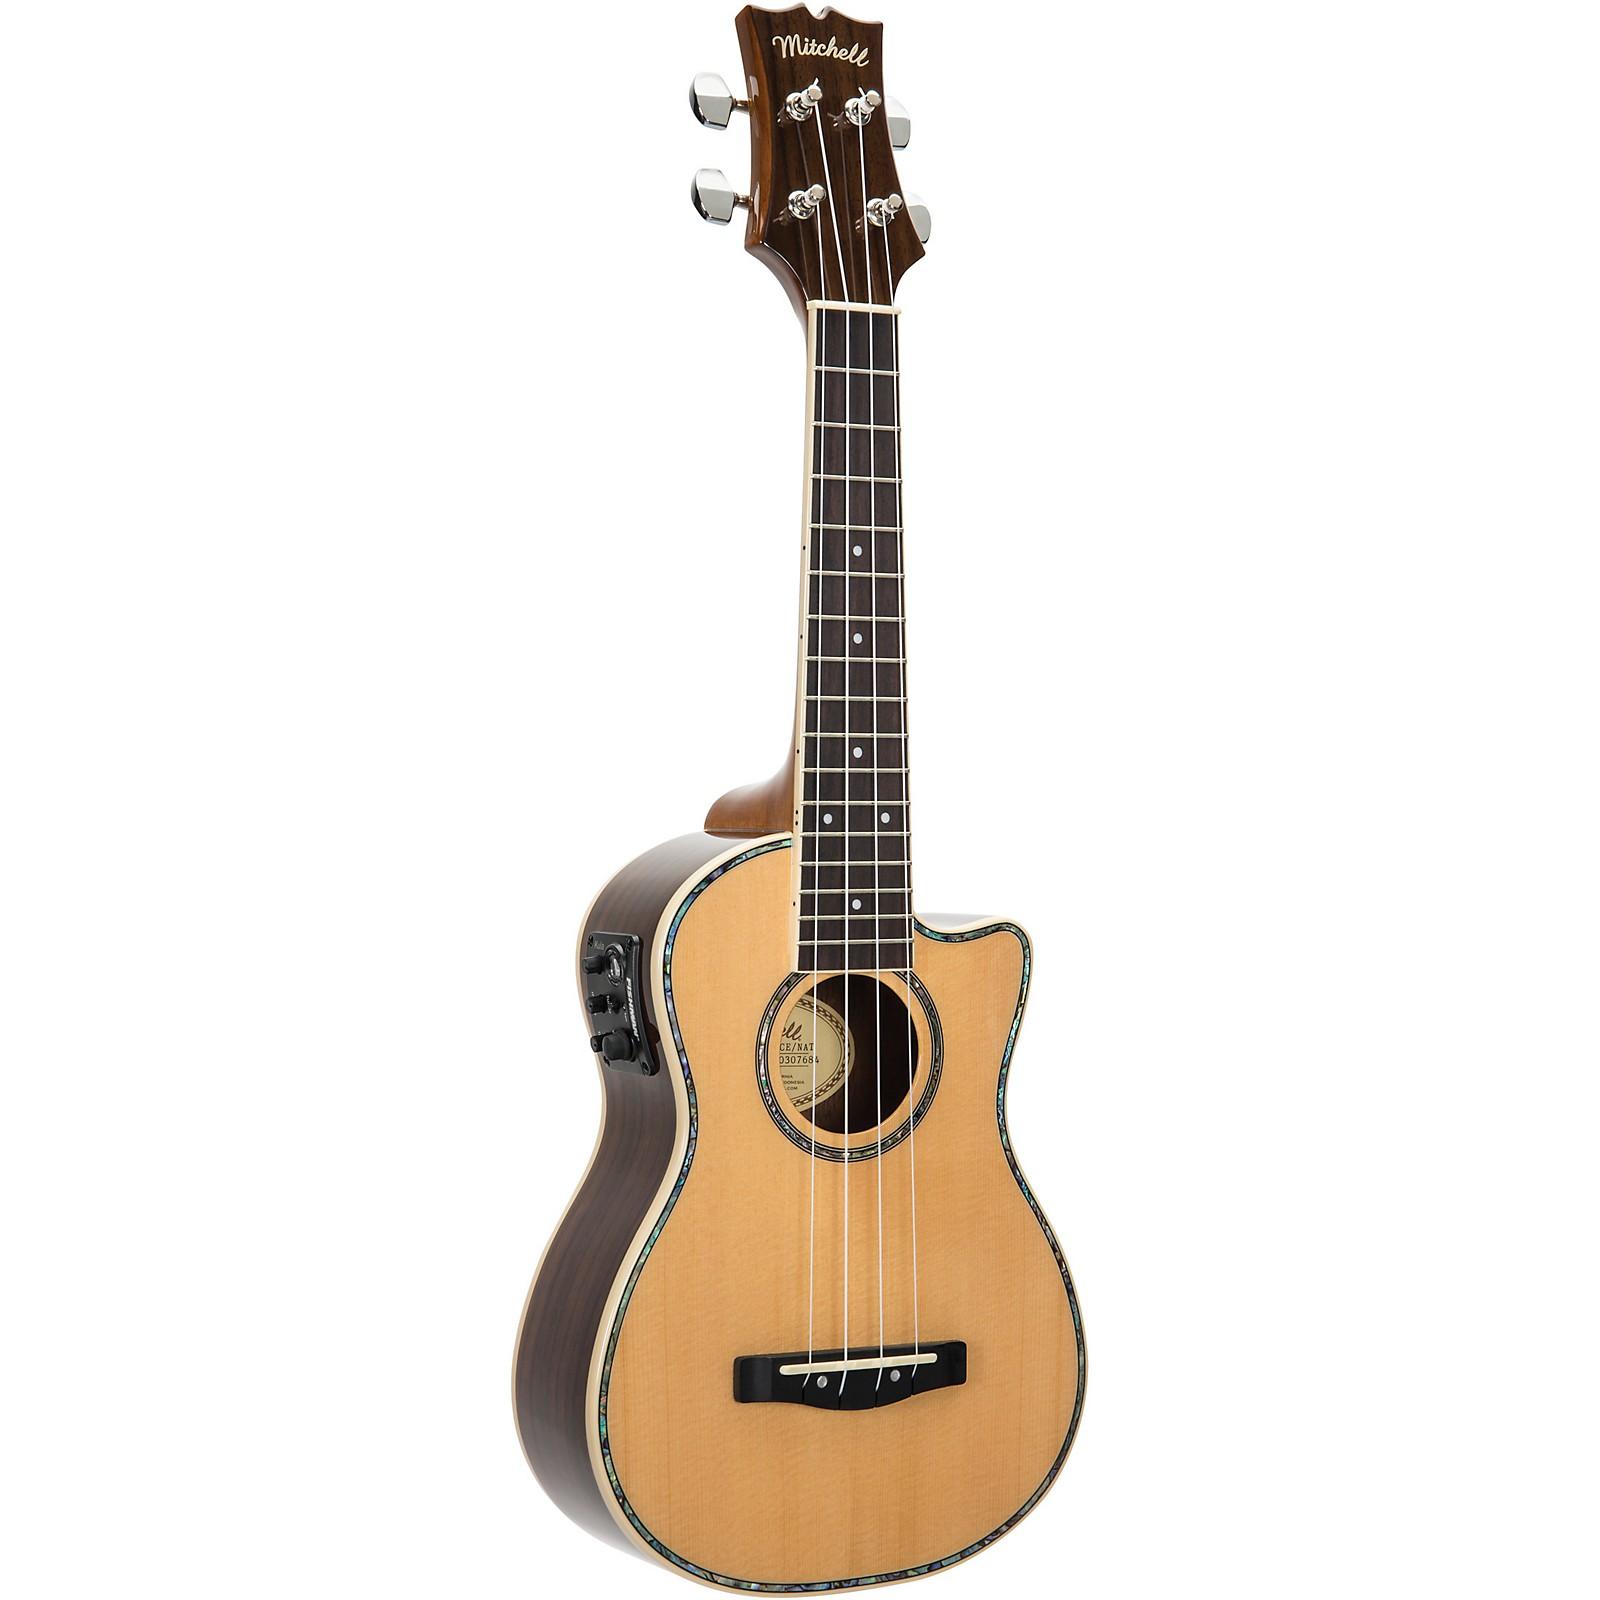 Mitchell MU70CE Cutaway Acoustic-Electric Concert Ukulele